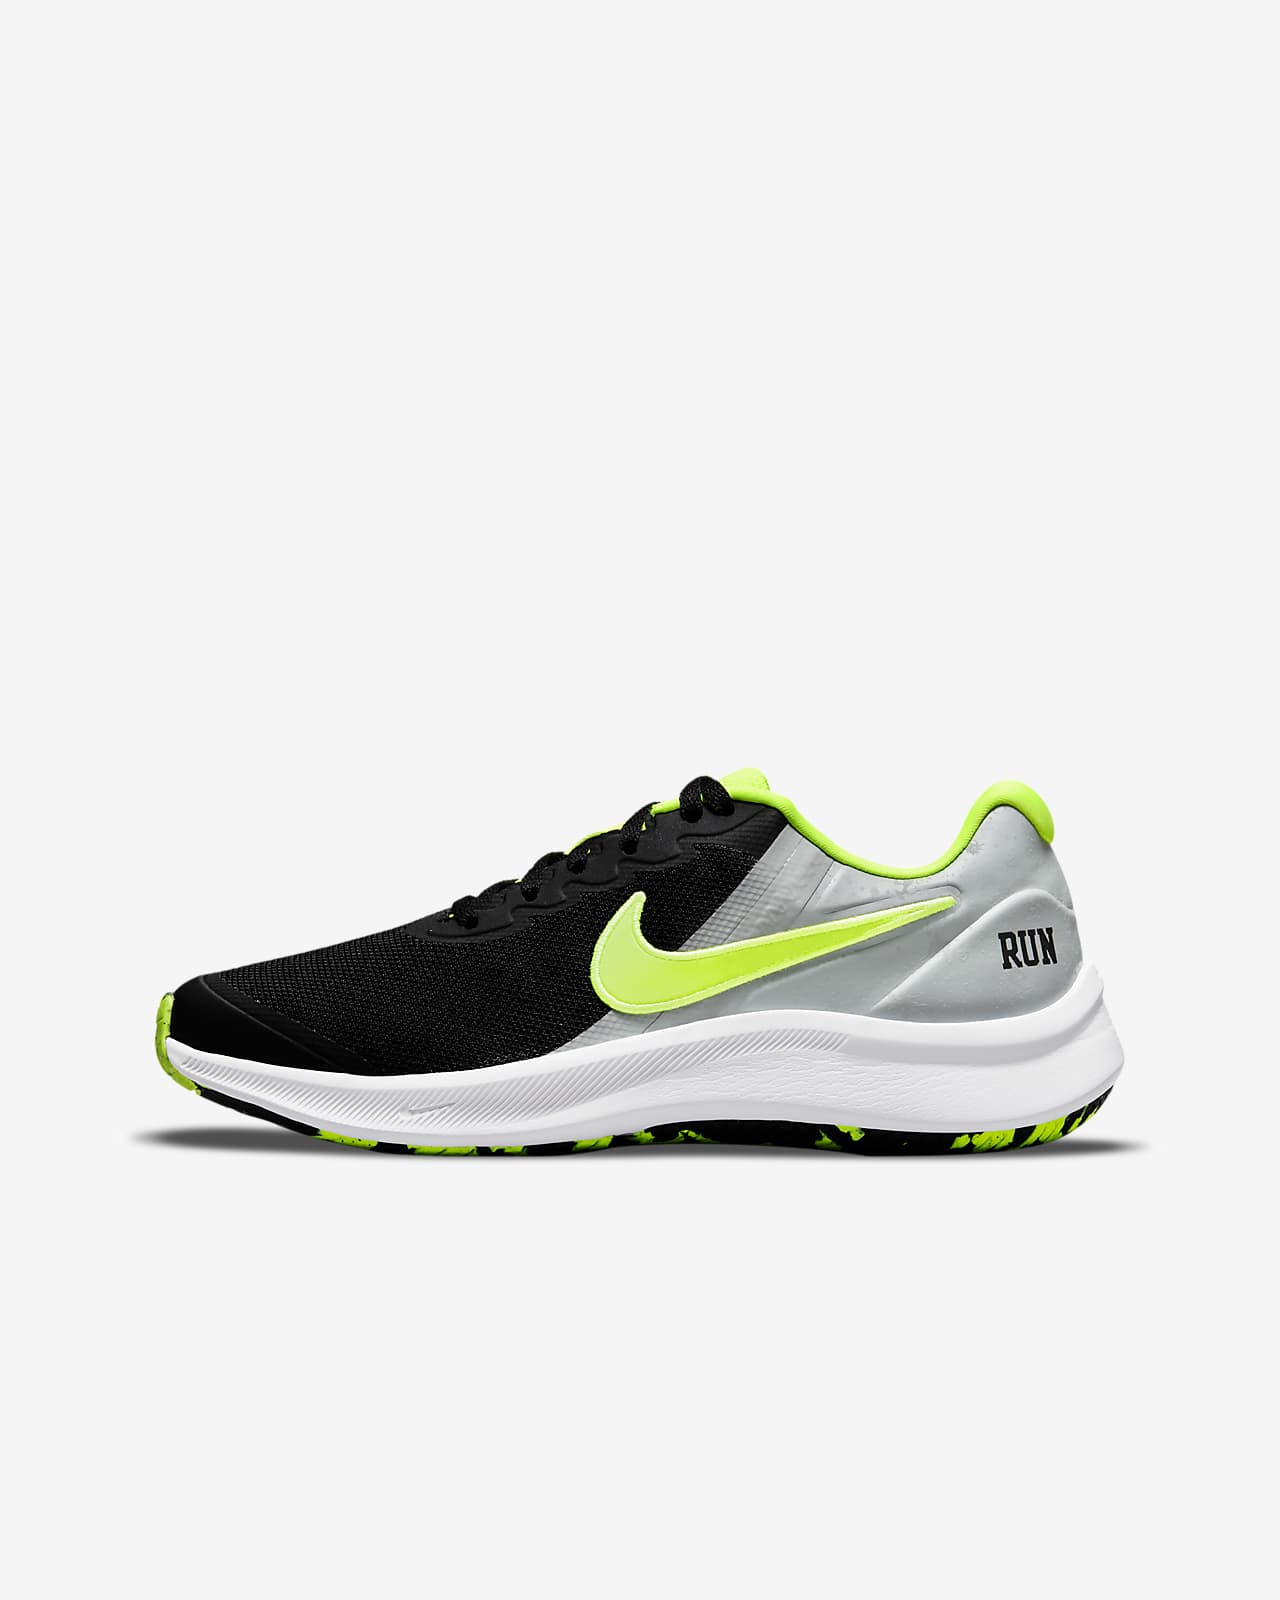 Nike Star Runner 3 Play Big Kids' Road Running Shoes